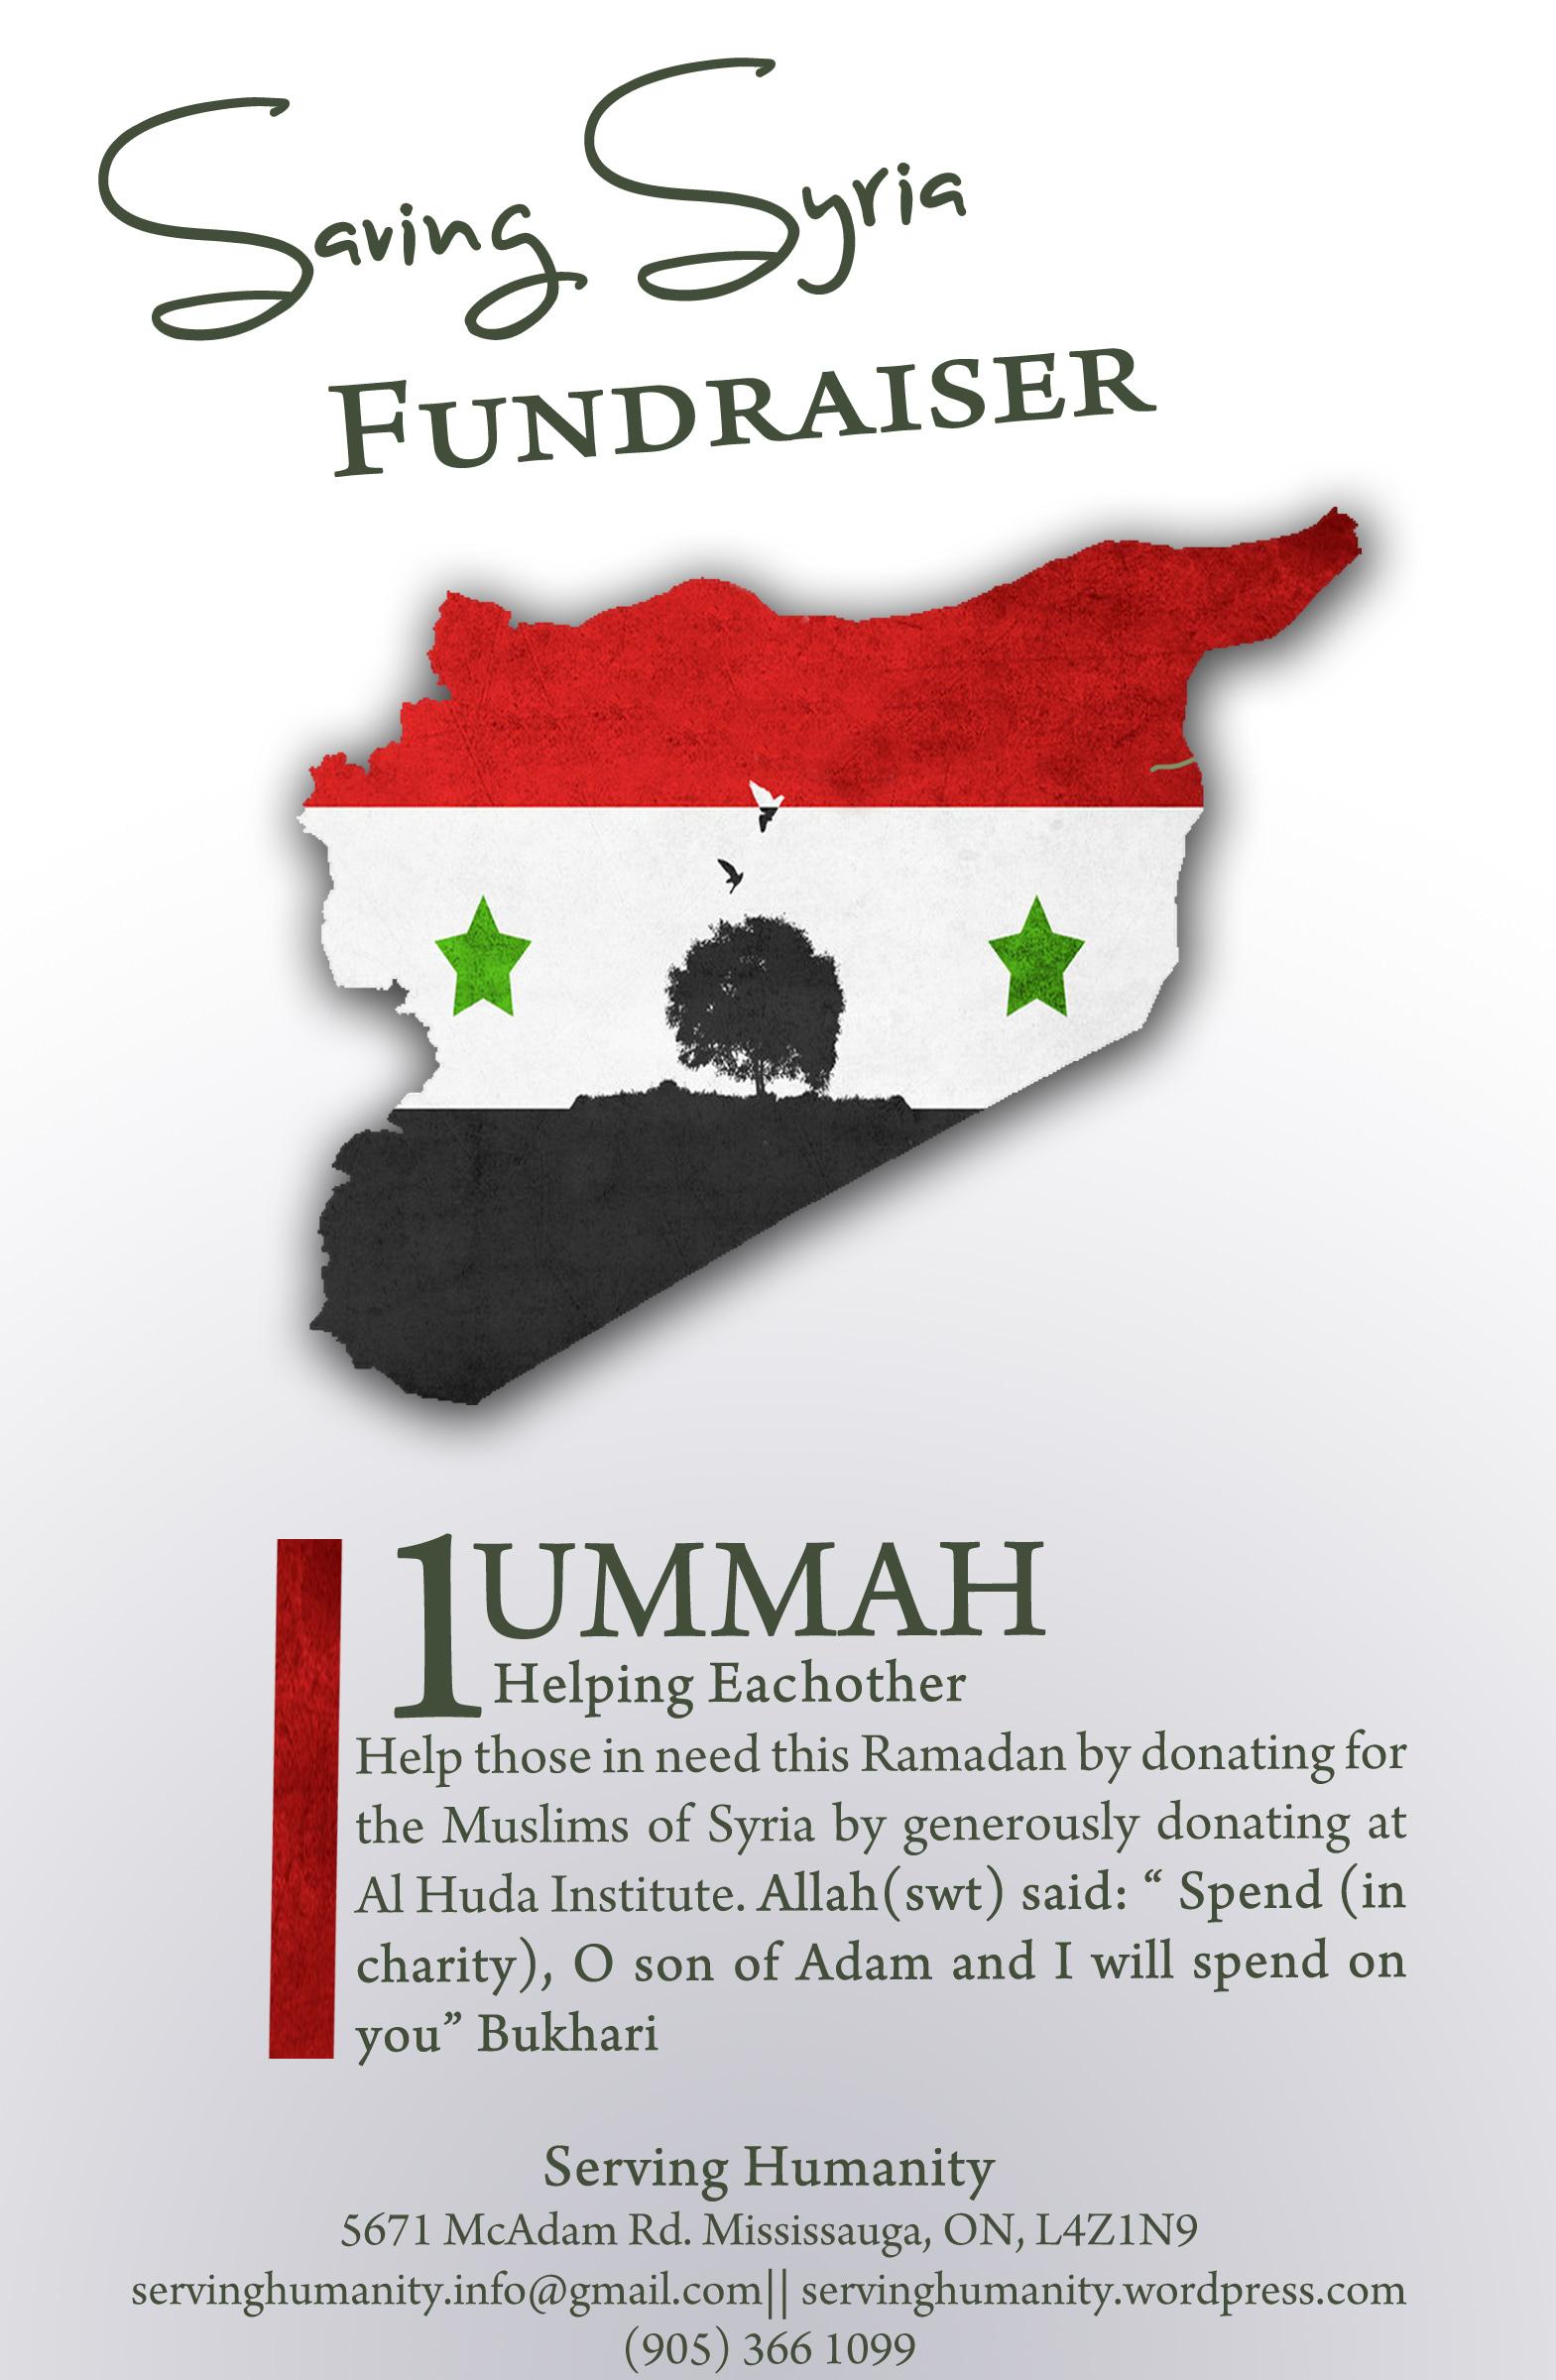 SAVING SYRIA FUNDRAISER!